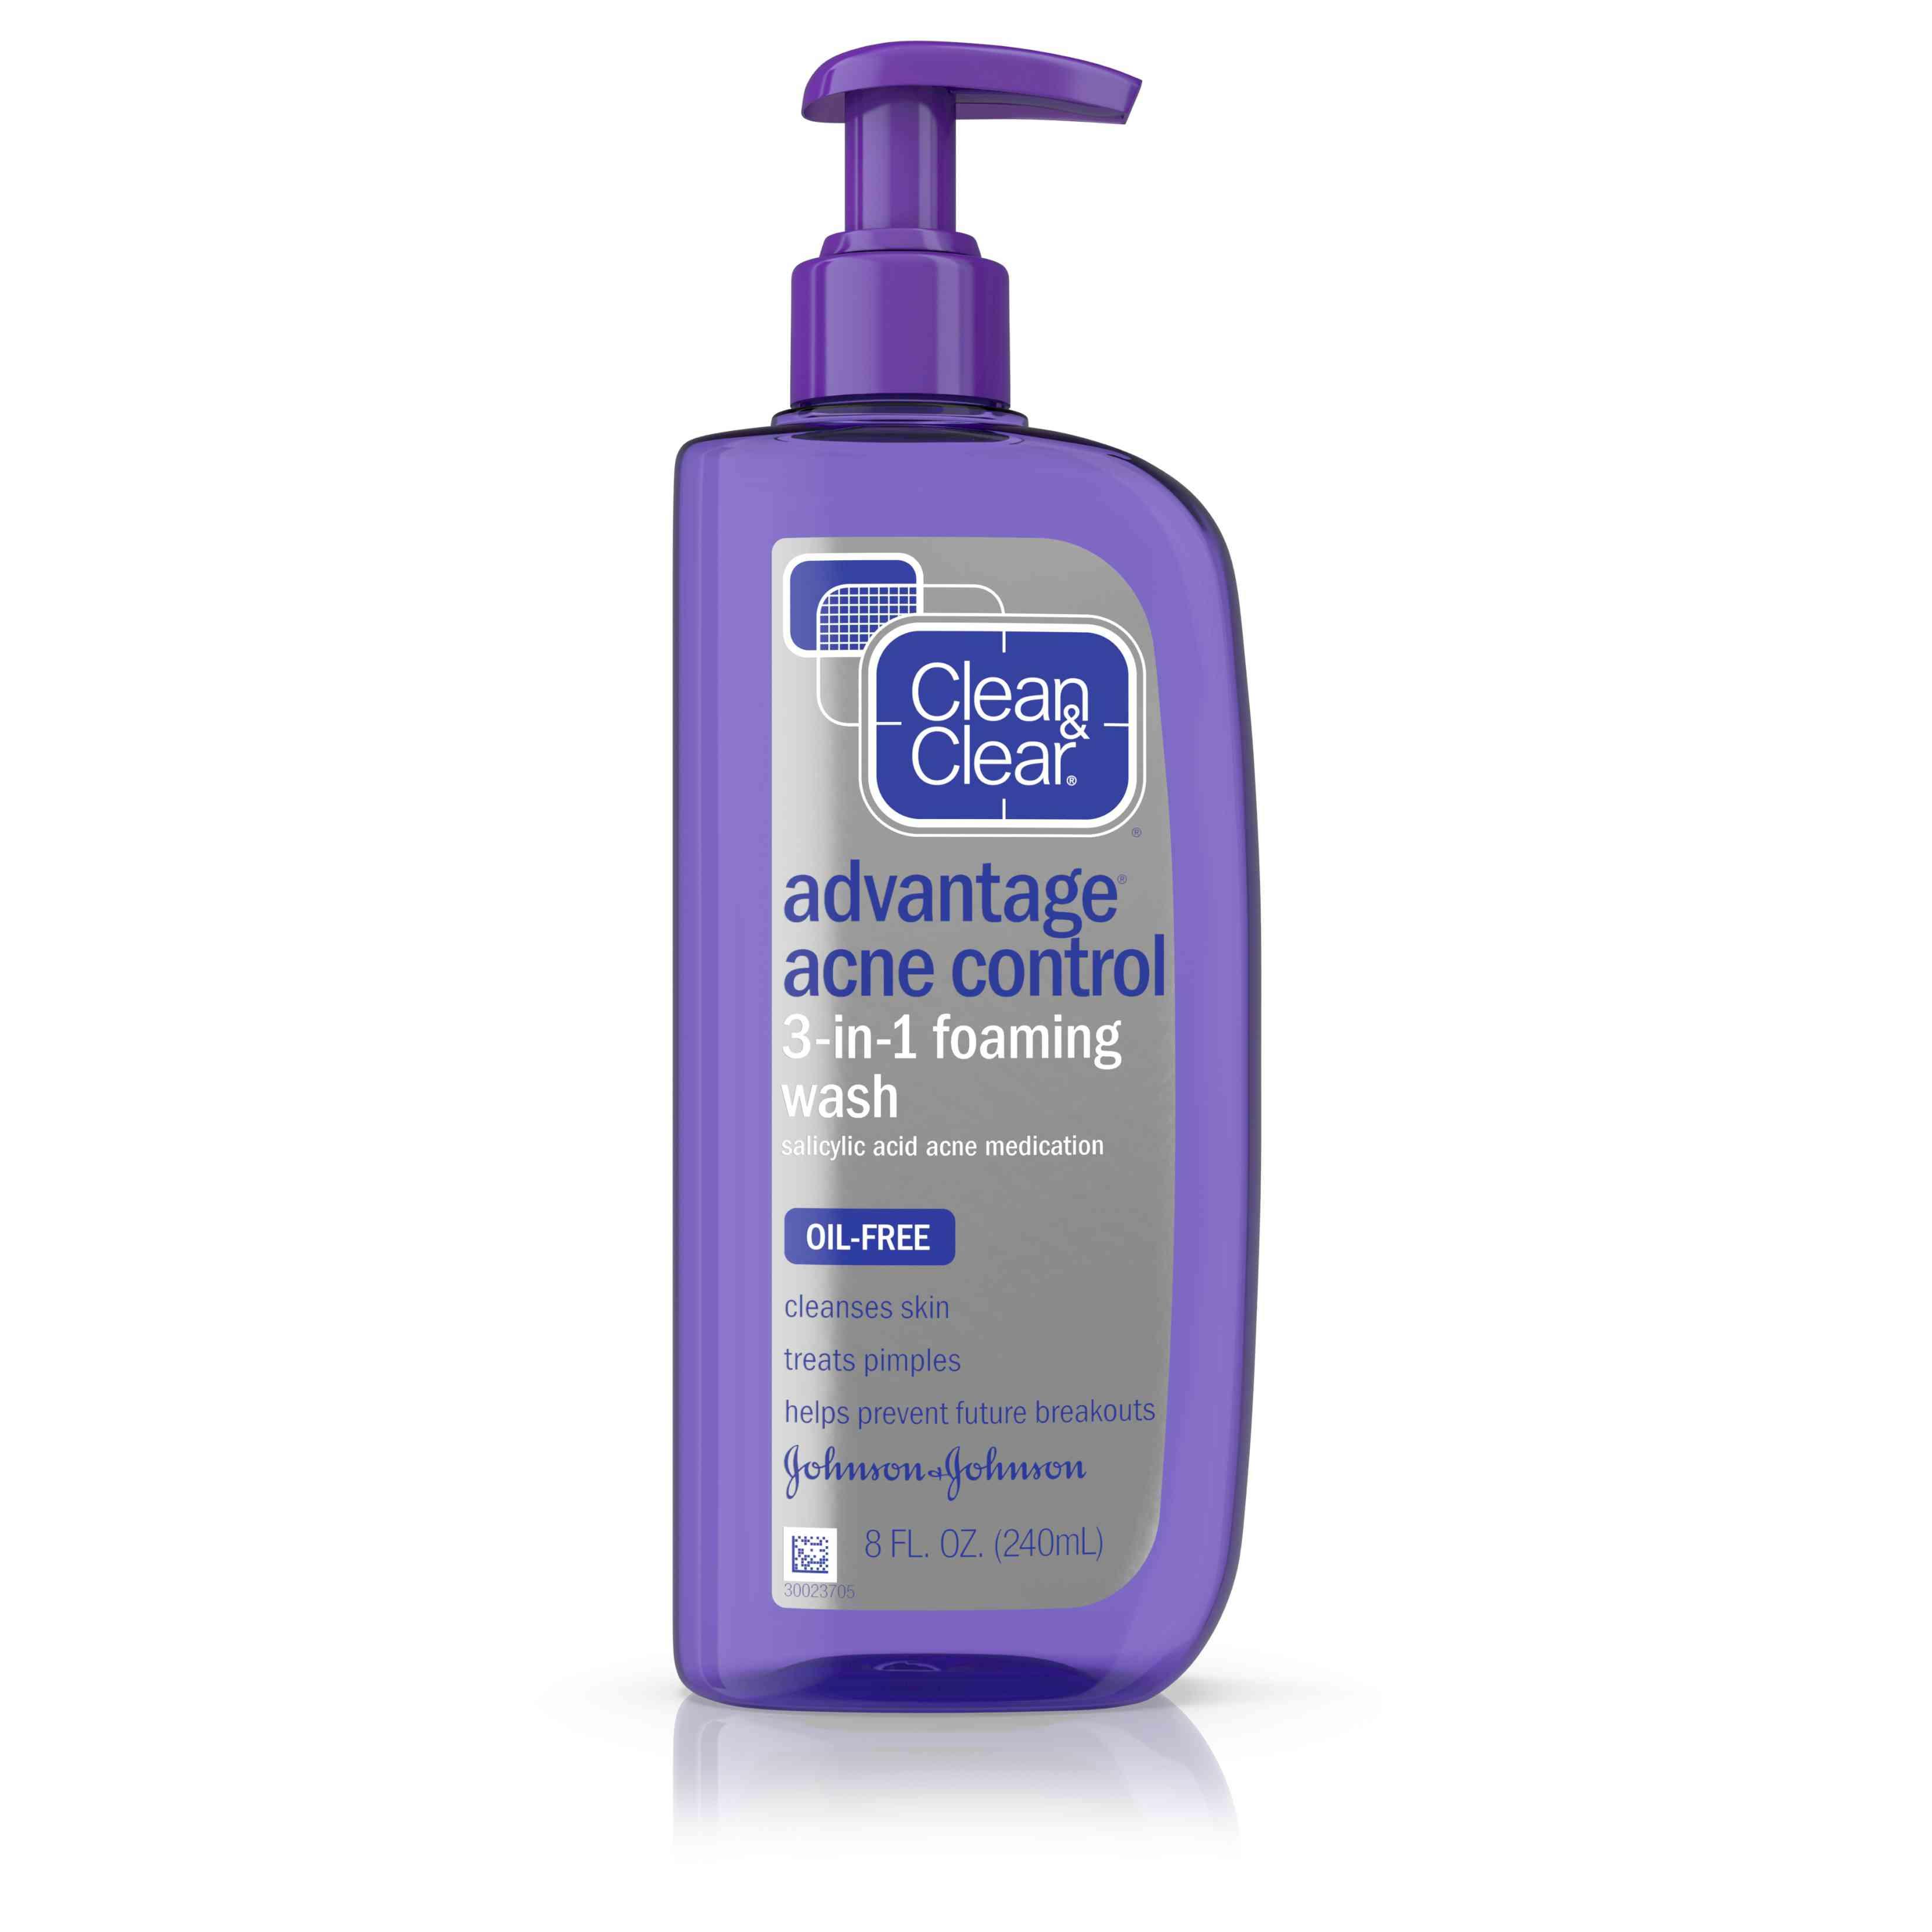 Clean & Clear Advantage Acne Control 3-in-1 Foaming Wash